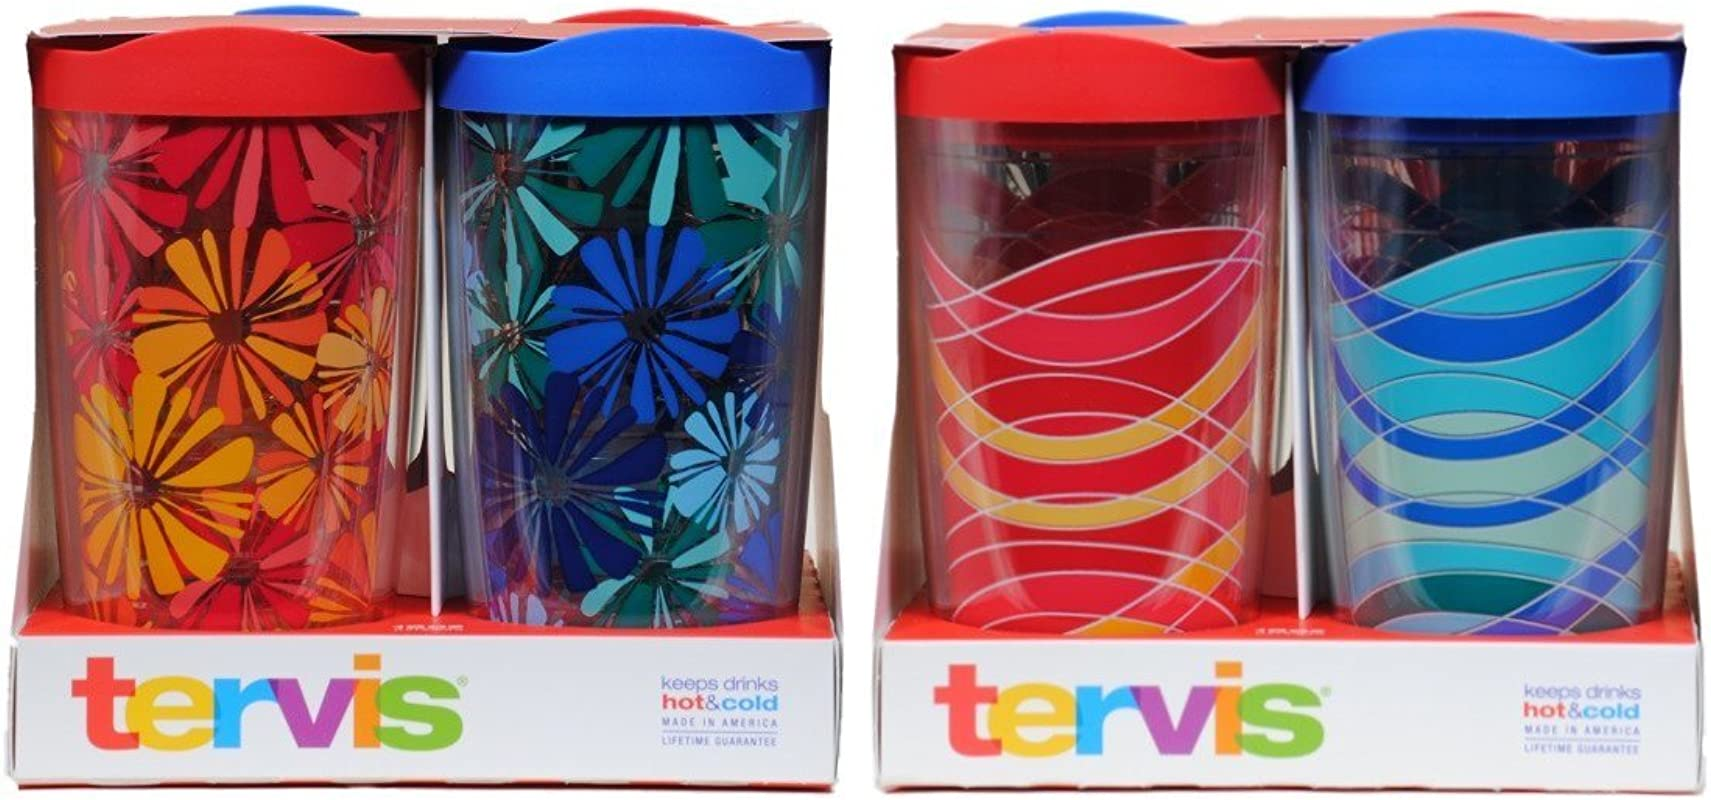 Tervis Tumbler 16oz Wave Celb Flower Wrap Design 4 Pack